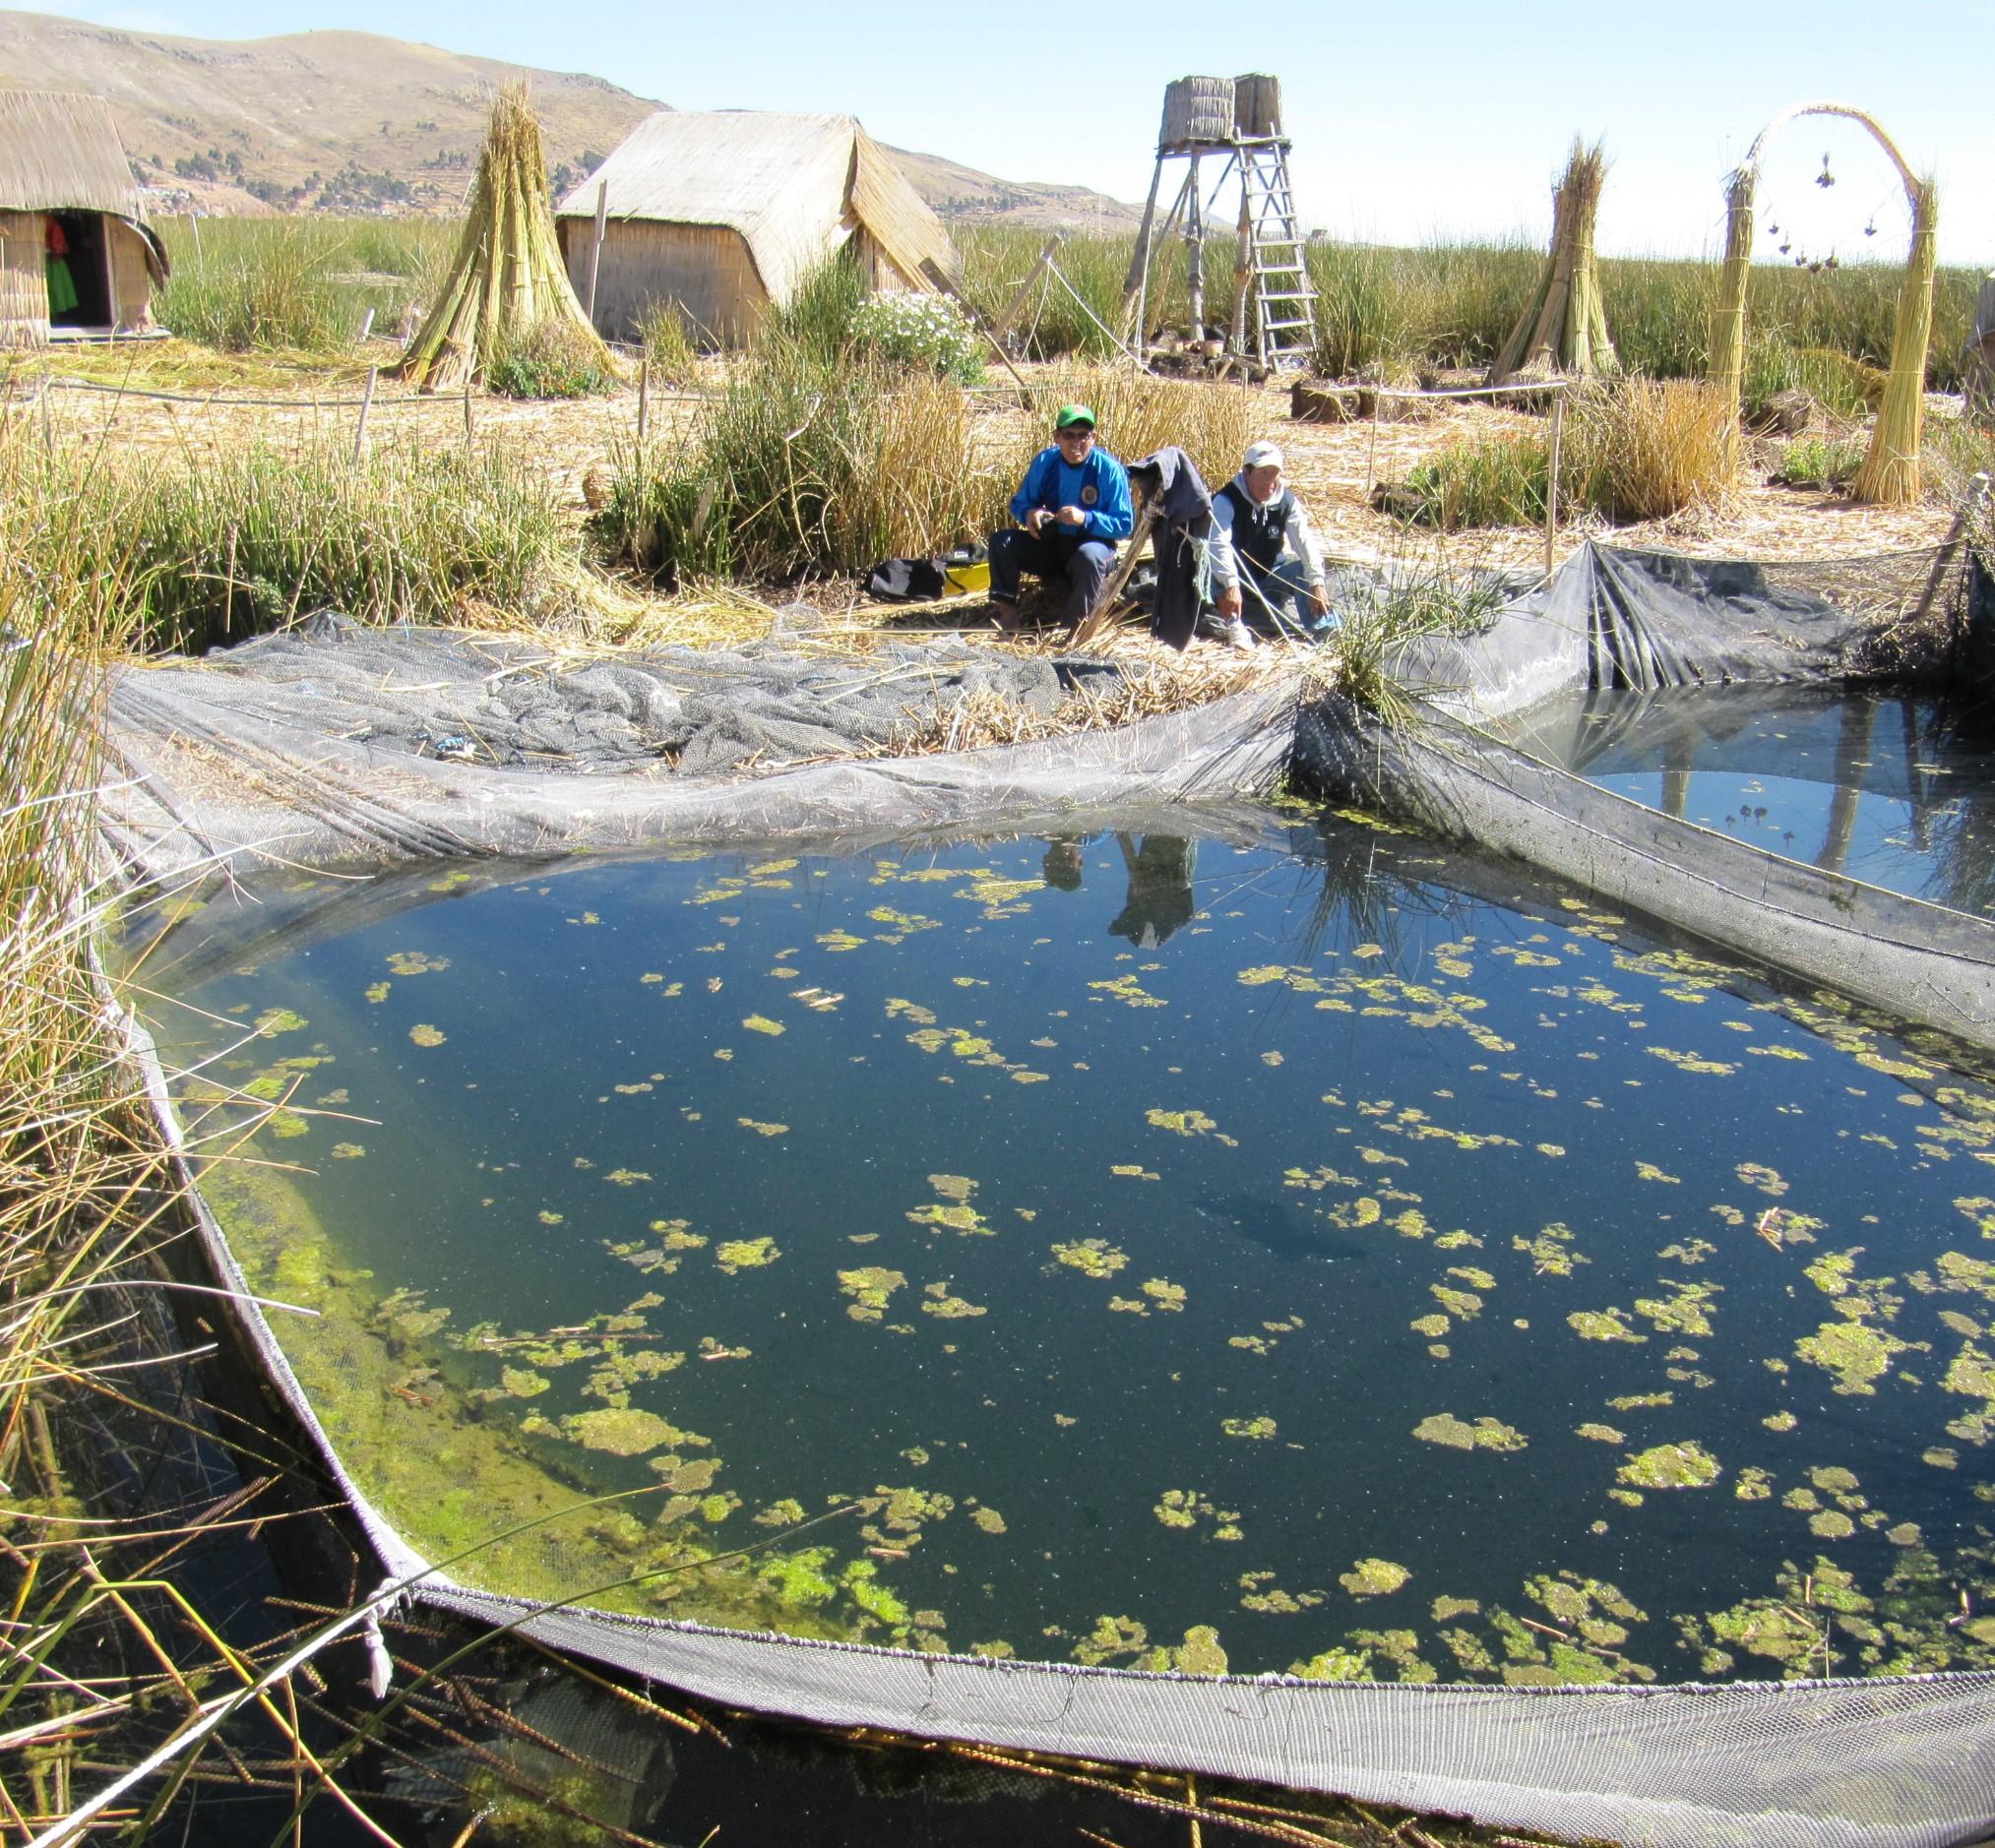 På Titicacasjön